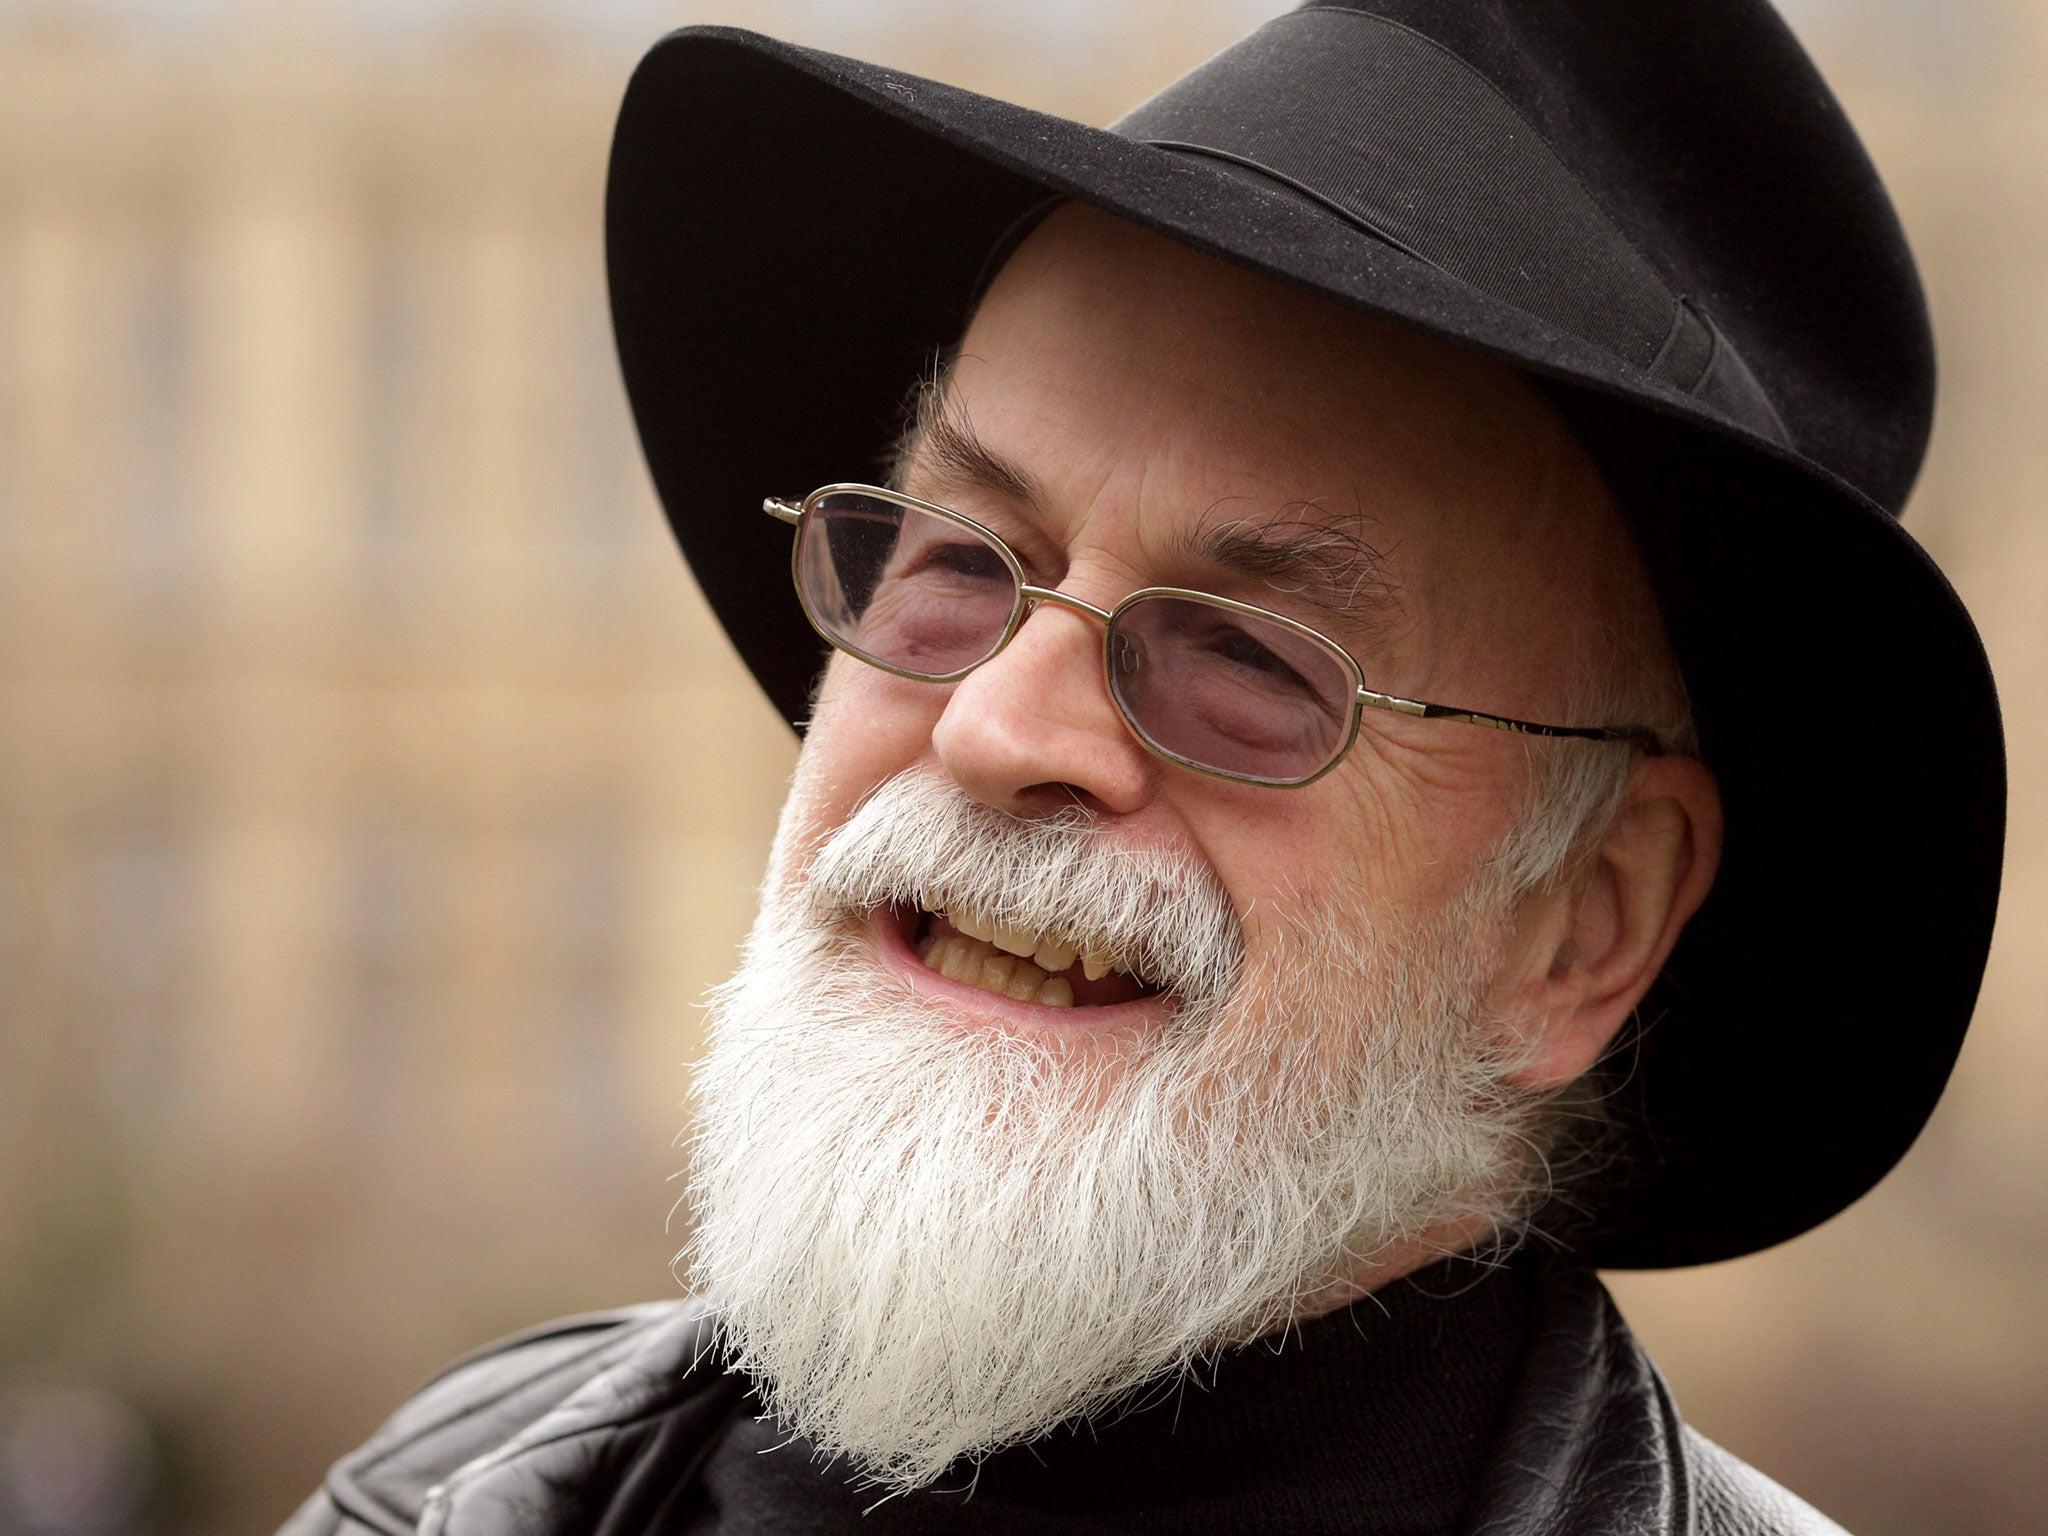 Terry Pratchett Posts Poignant Final Conversation With